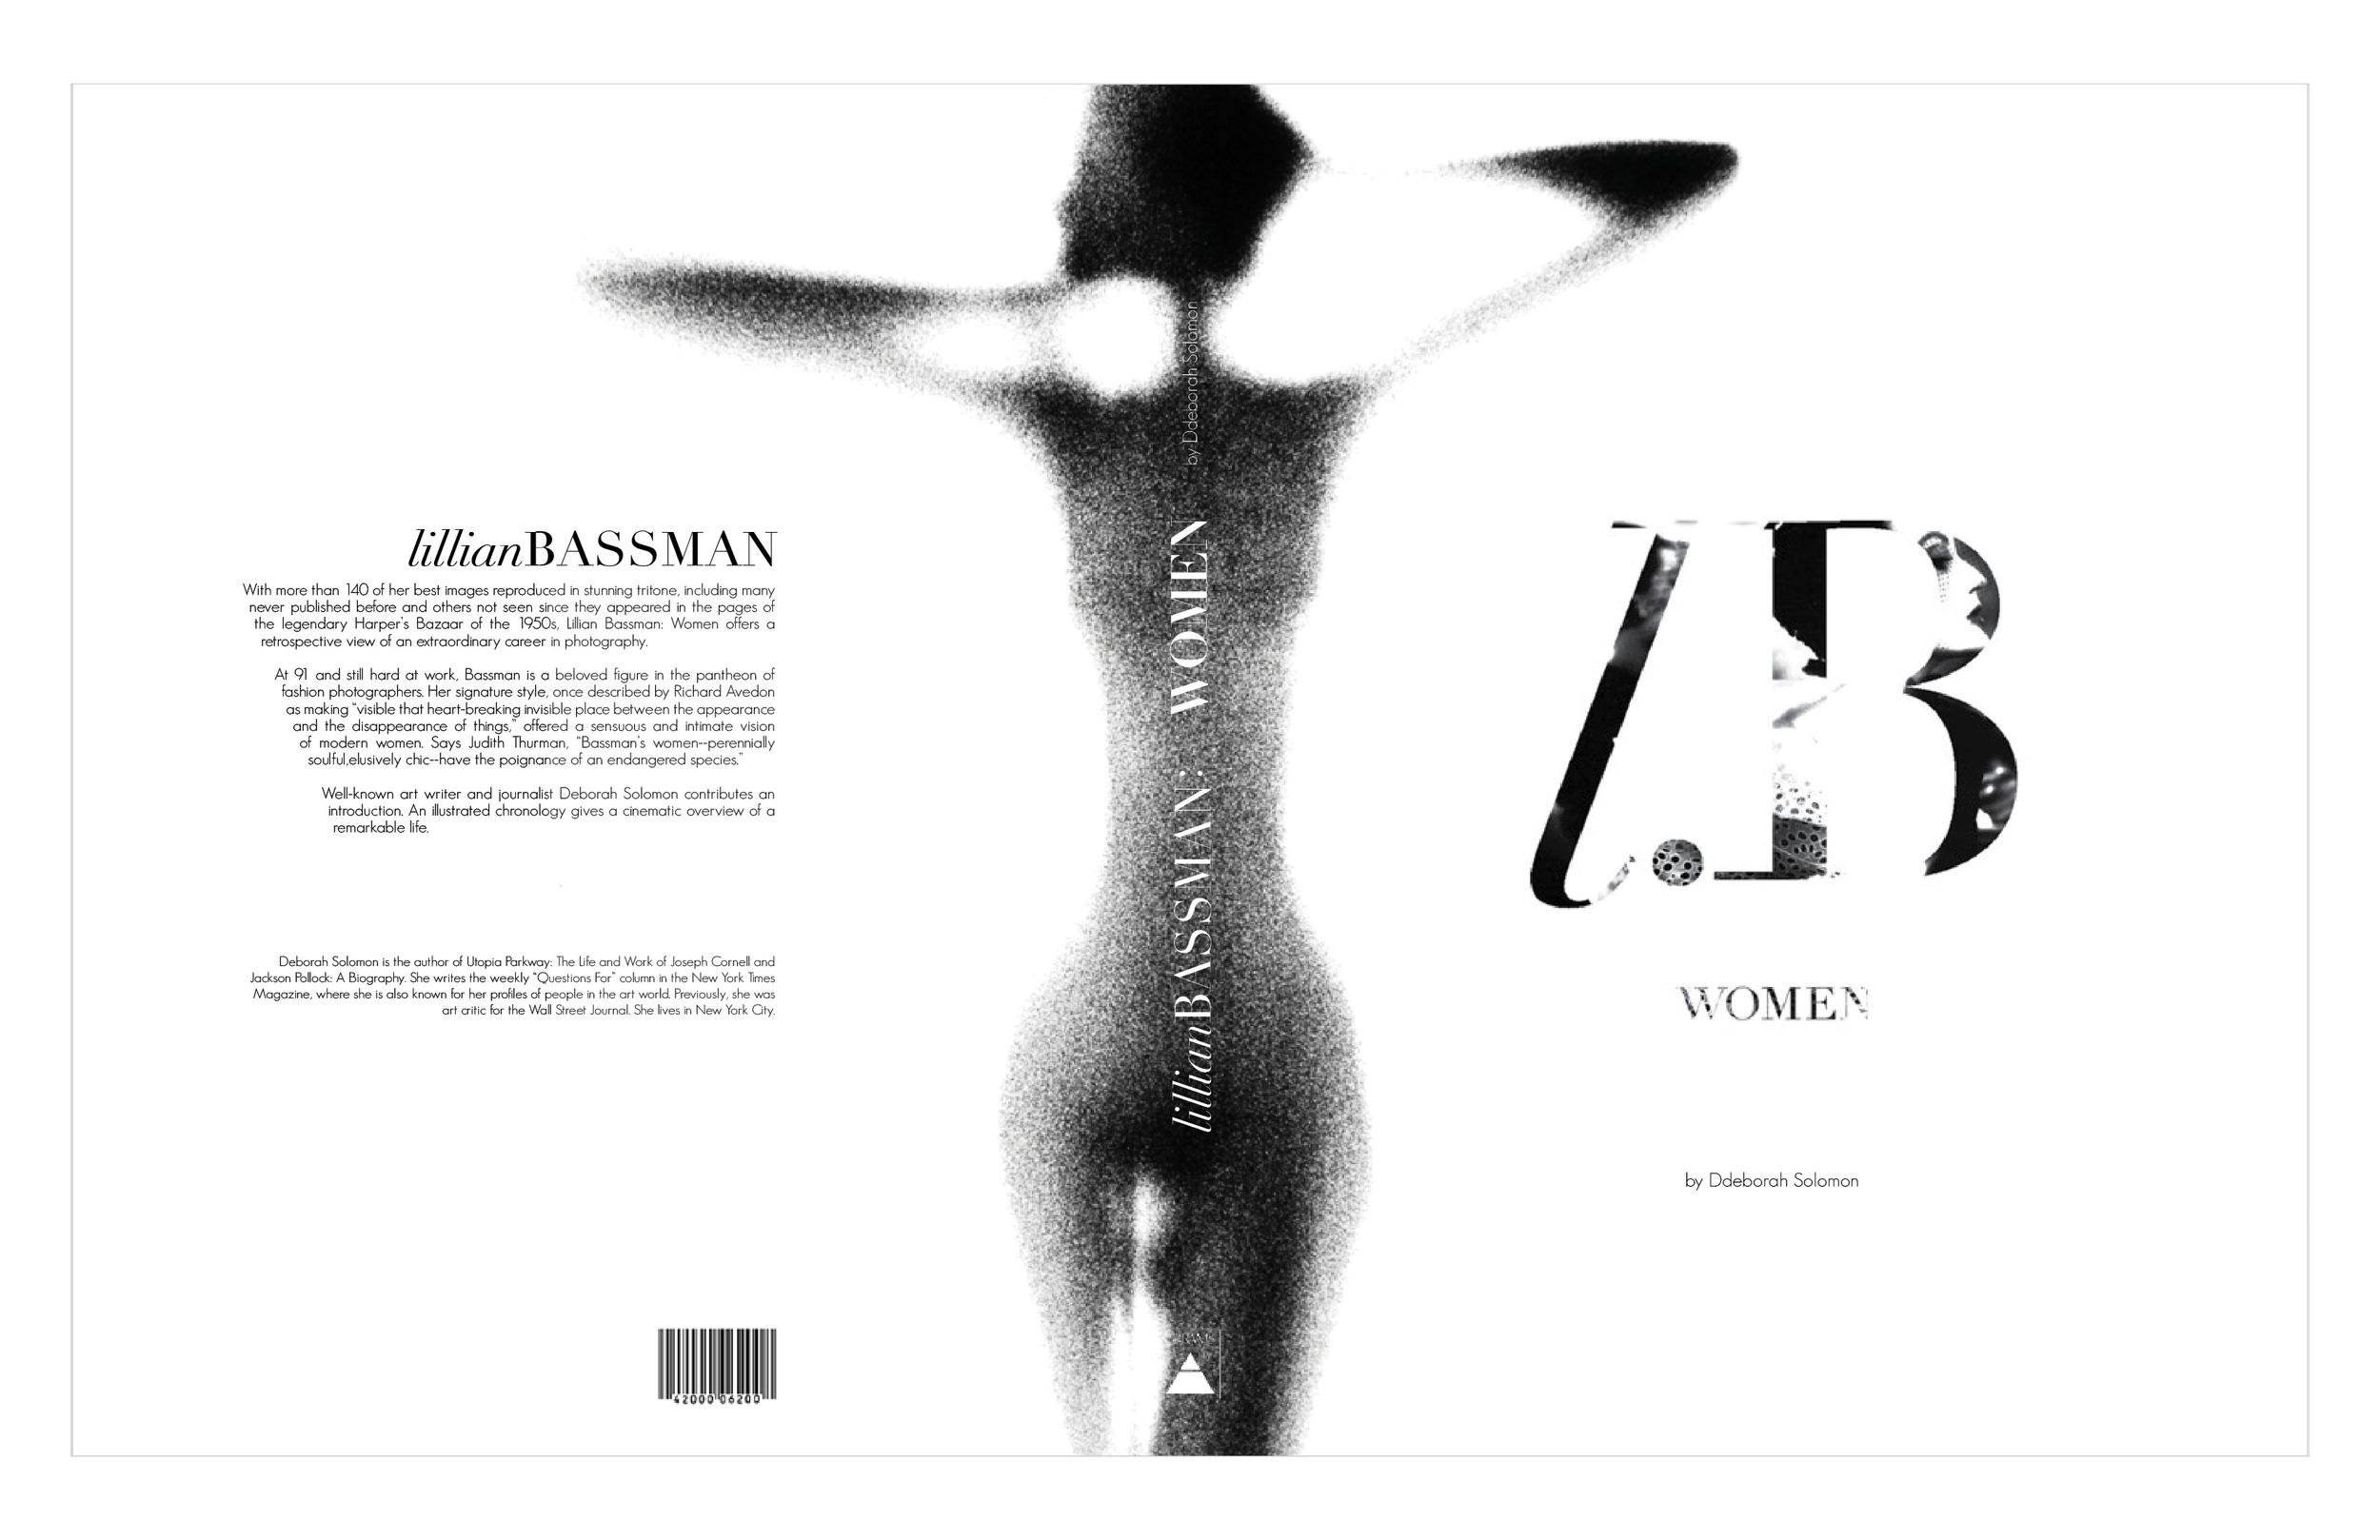 LILLIAN BASSMAN  Book cover design  Concept, illustration, photography & design for book on dessert sushi.  { Student Project }  2011